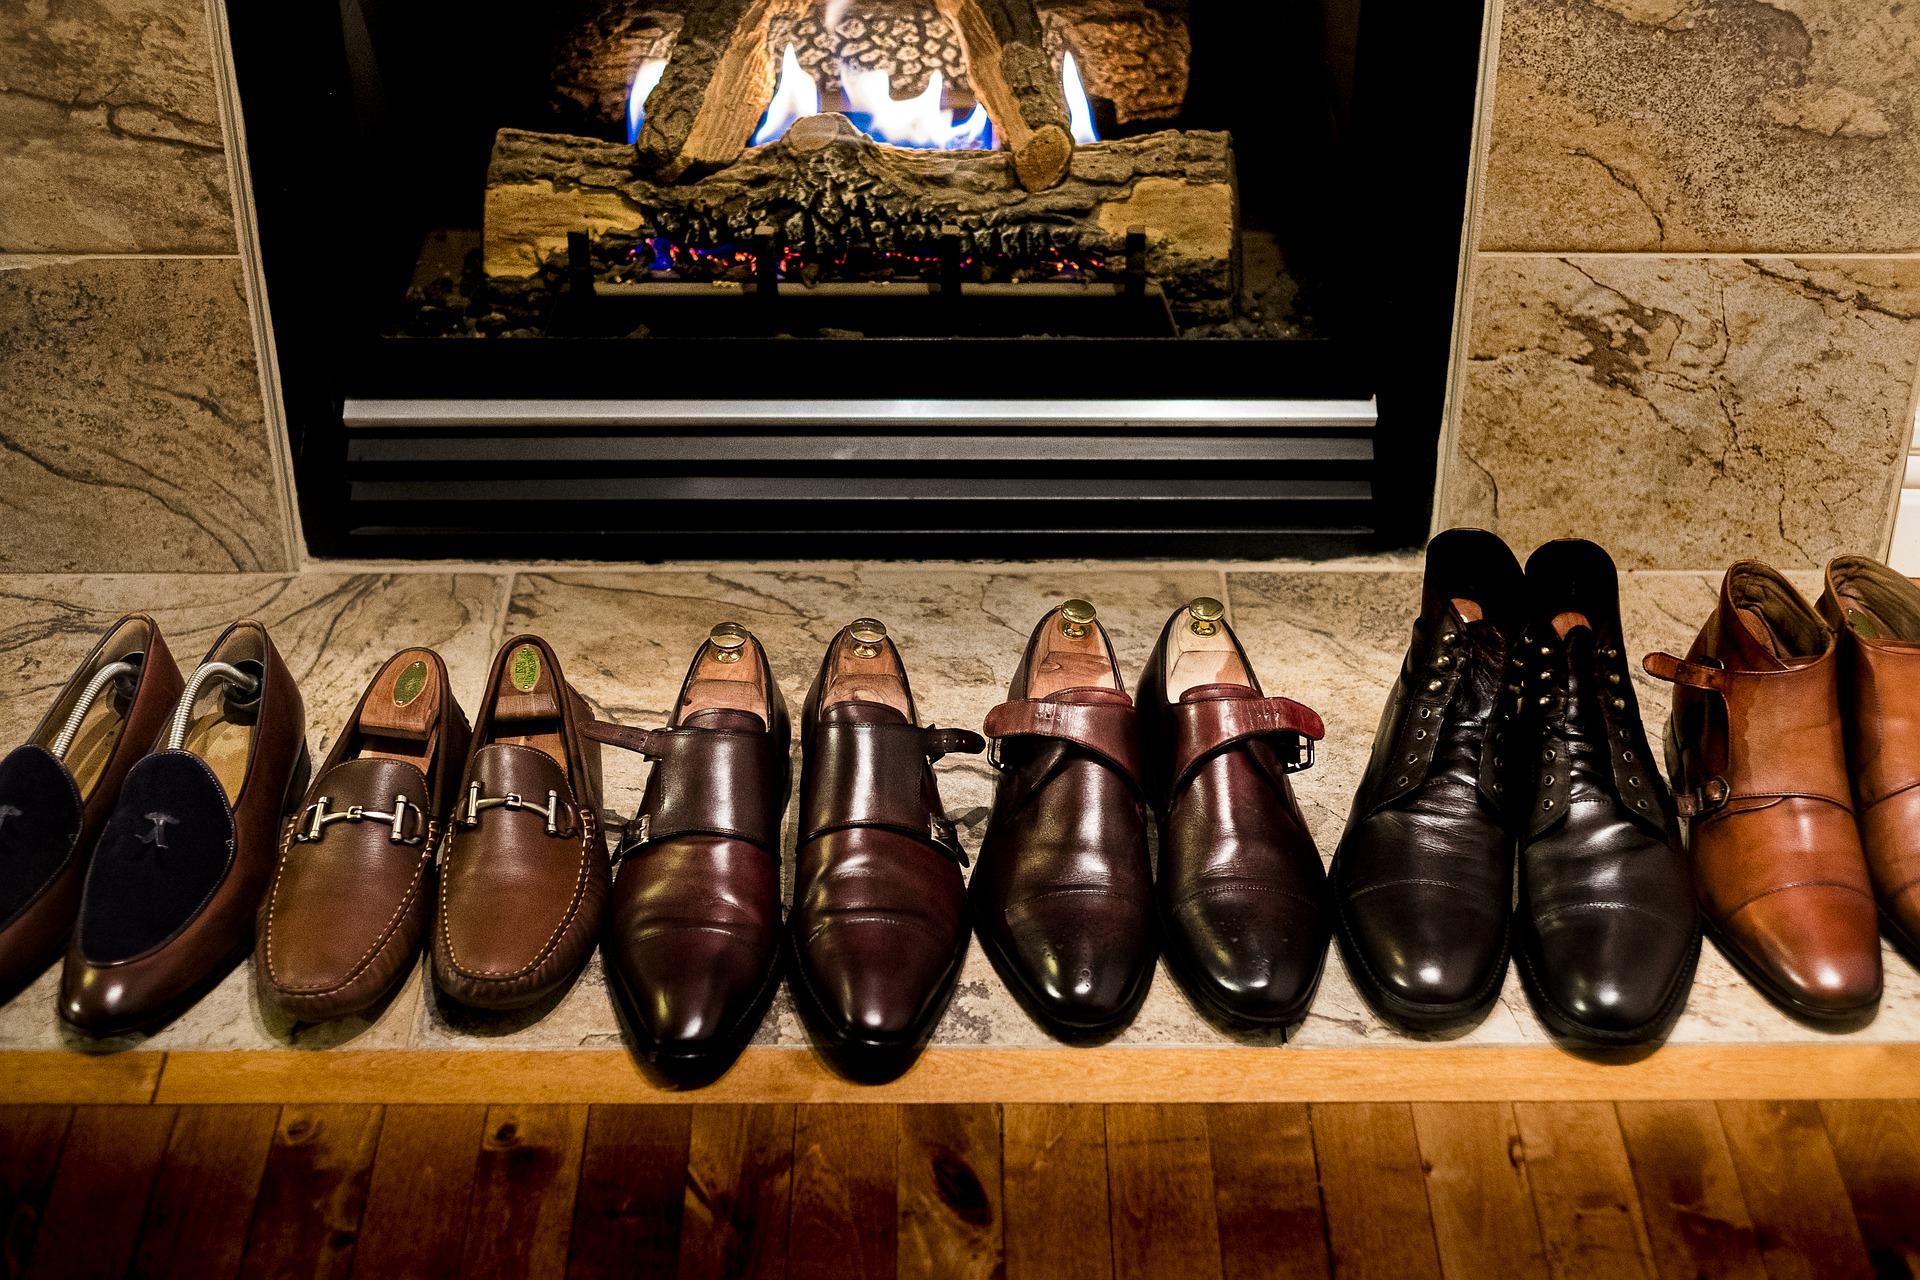 Schuhputzmaschine immer saubere Schuhe